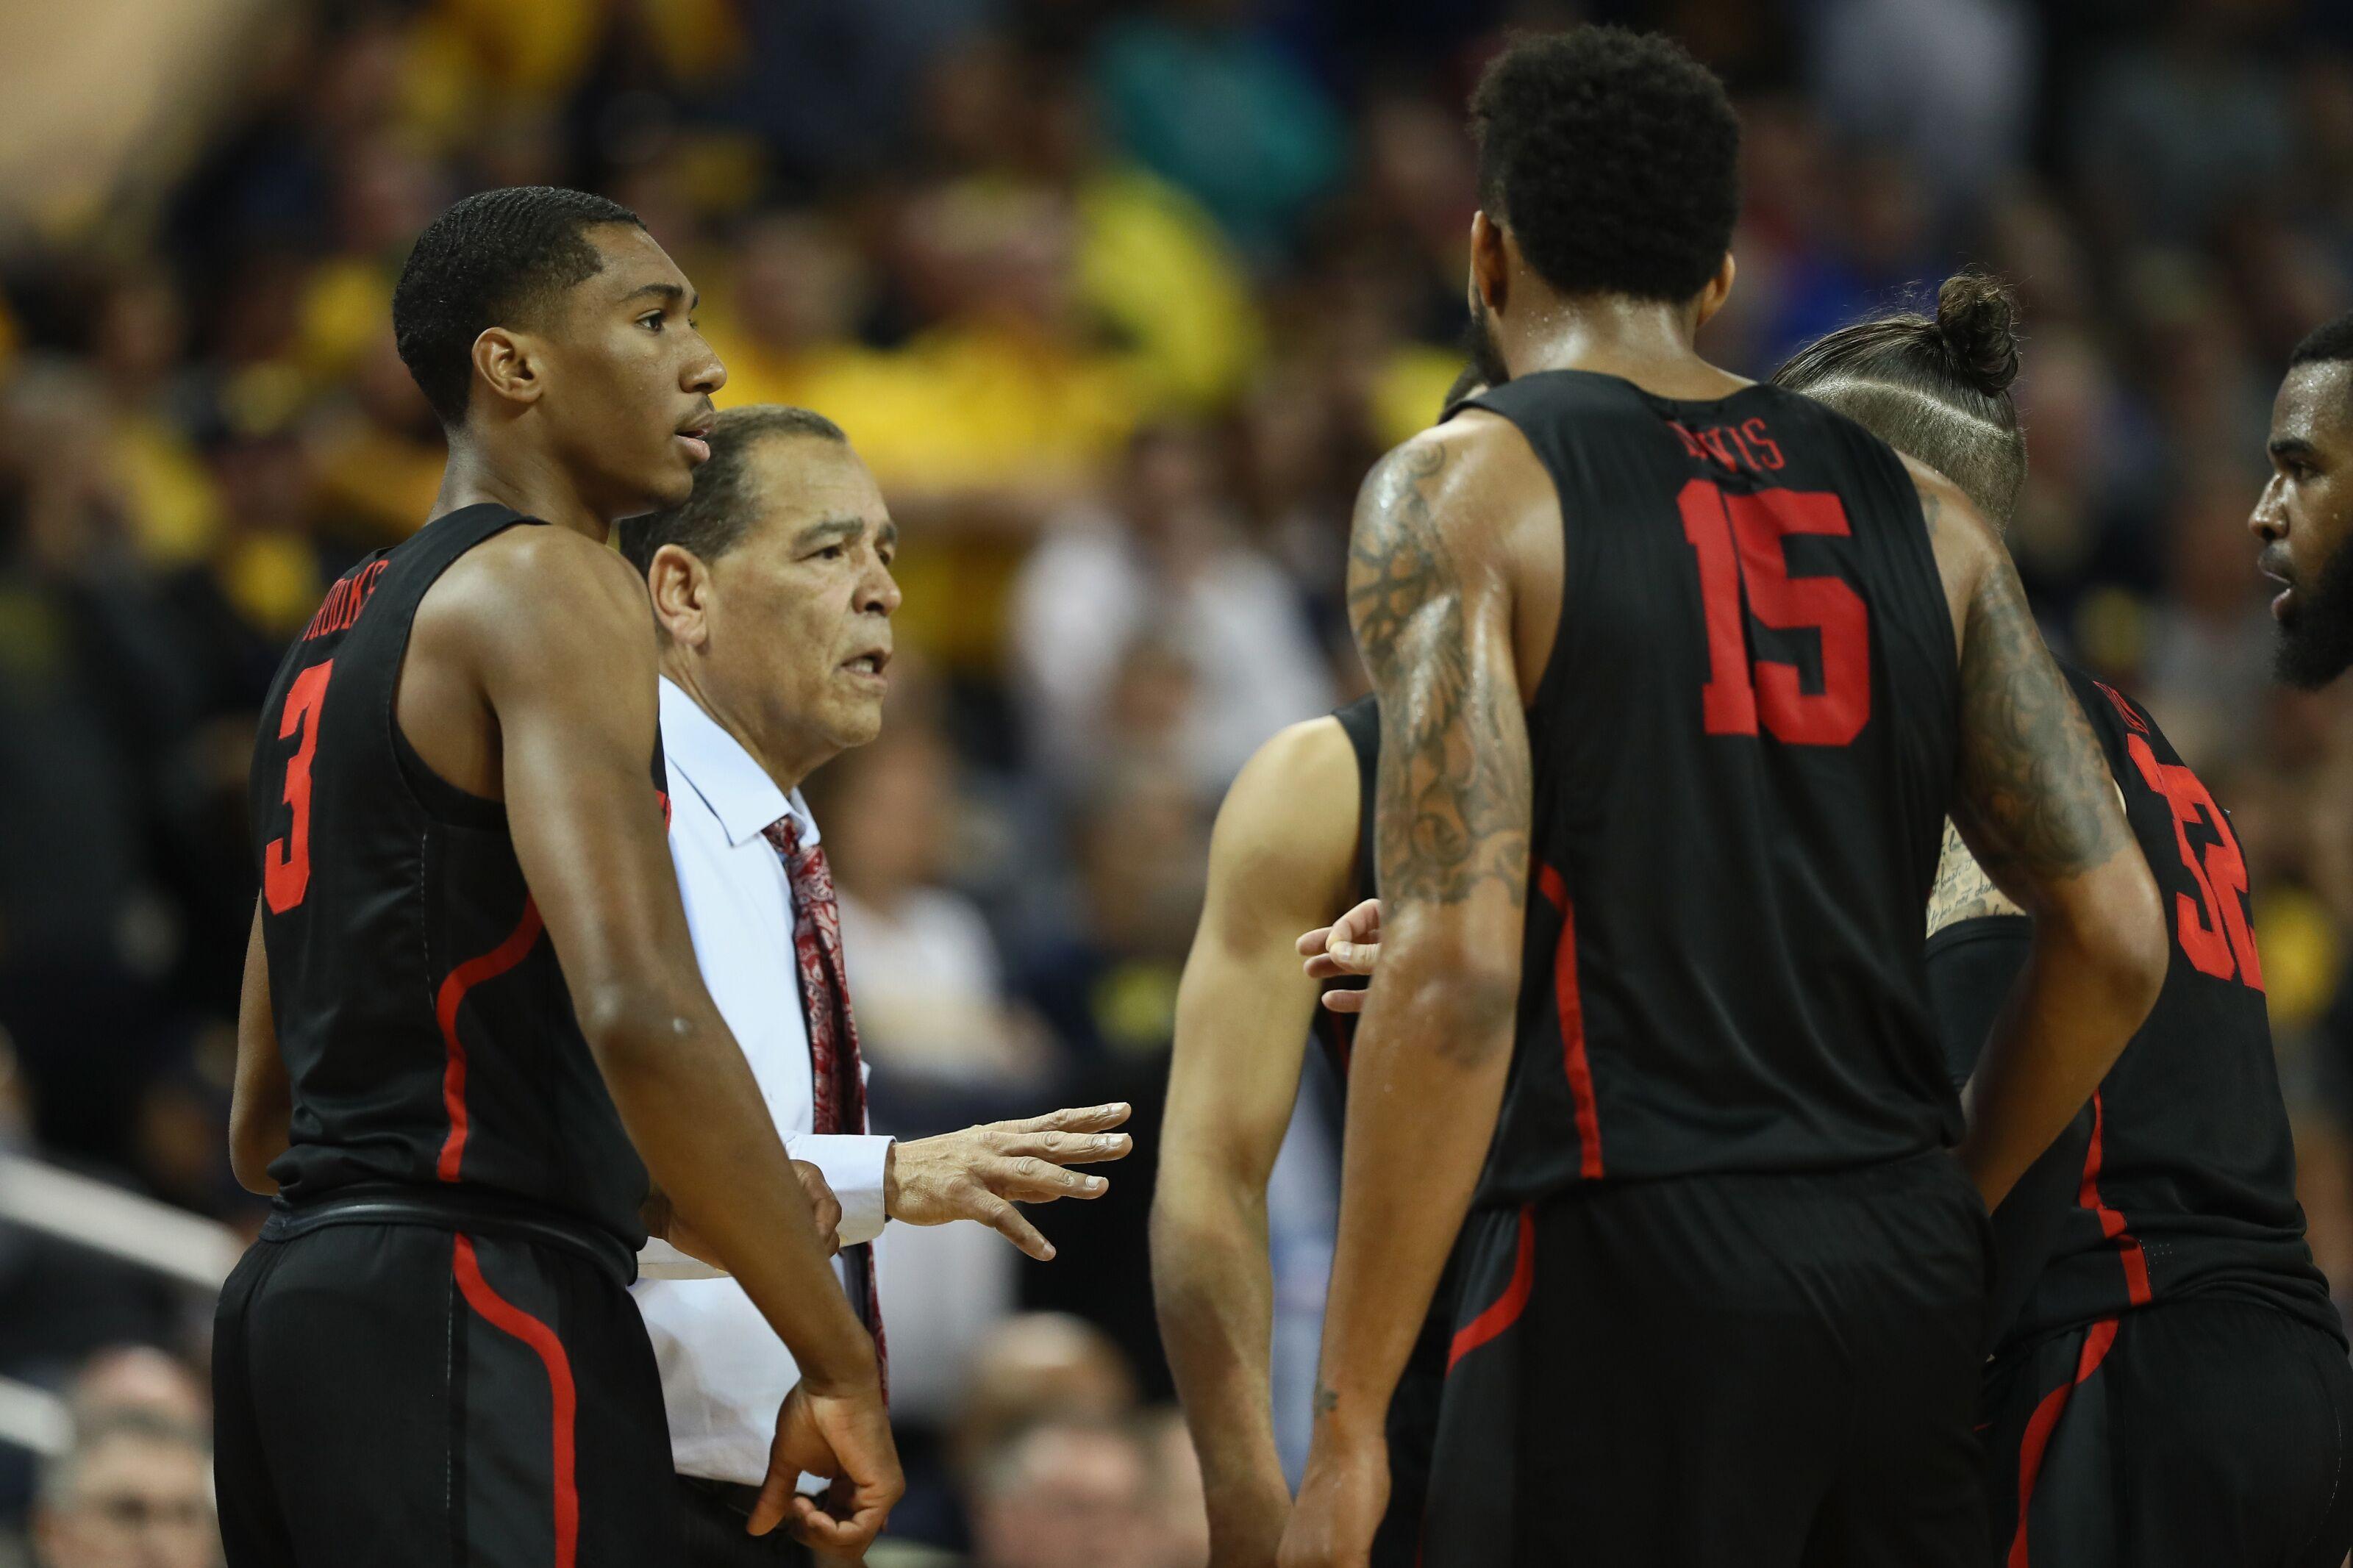 Houston Basketball: 3 keys for the game against LSU